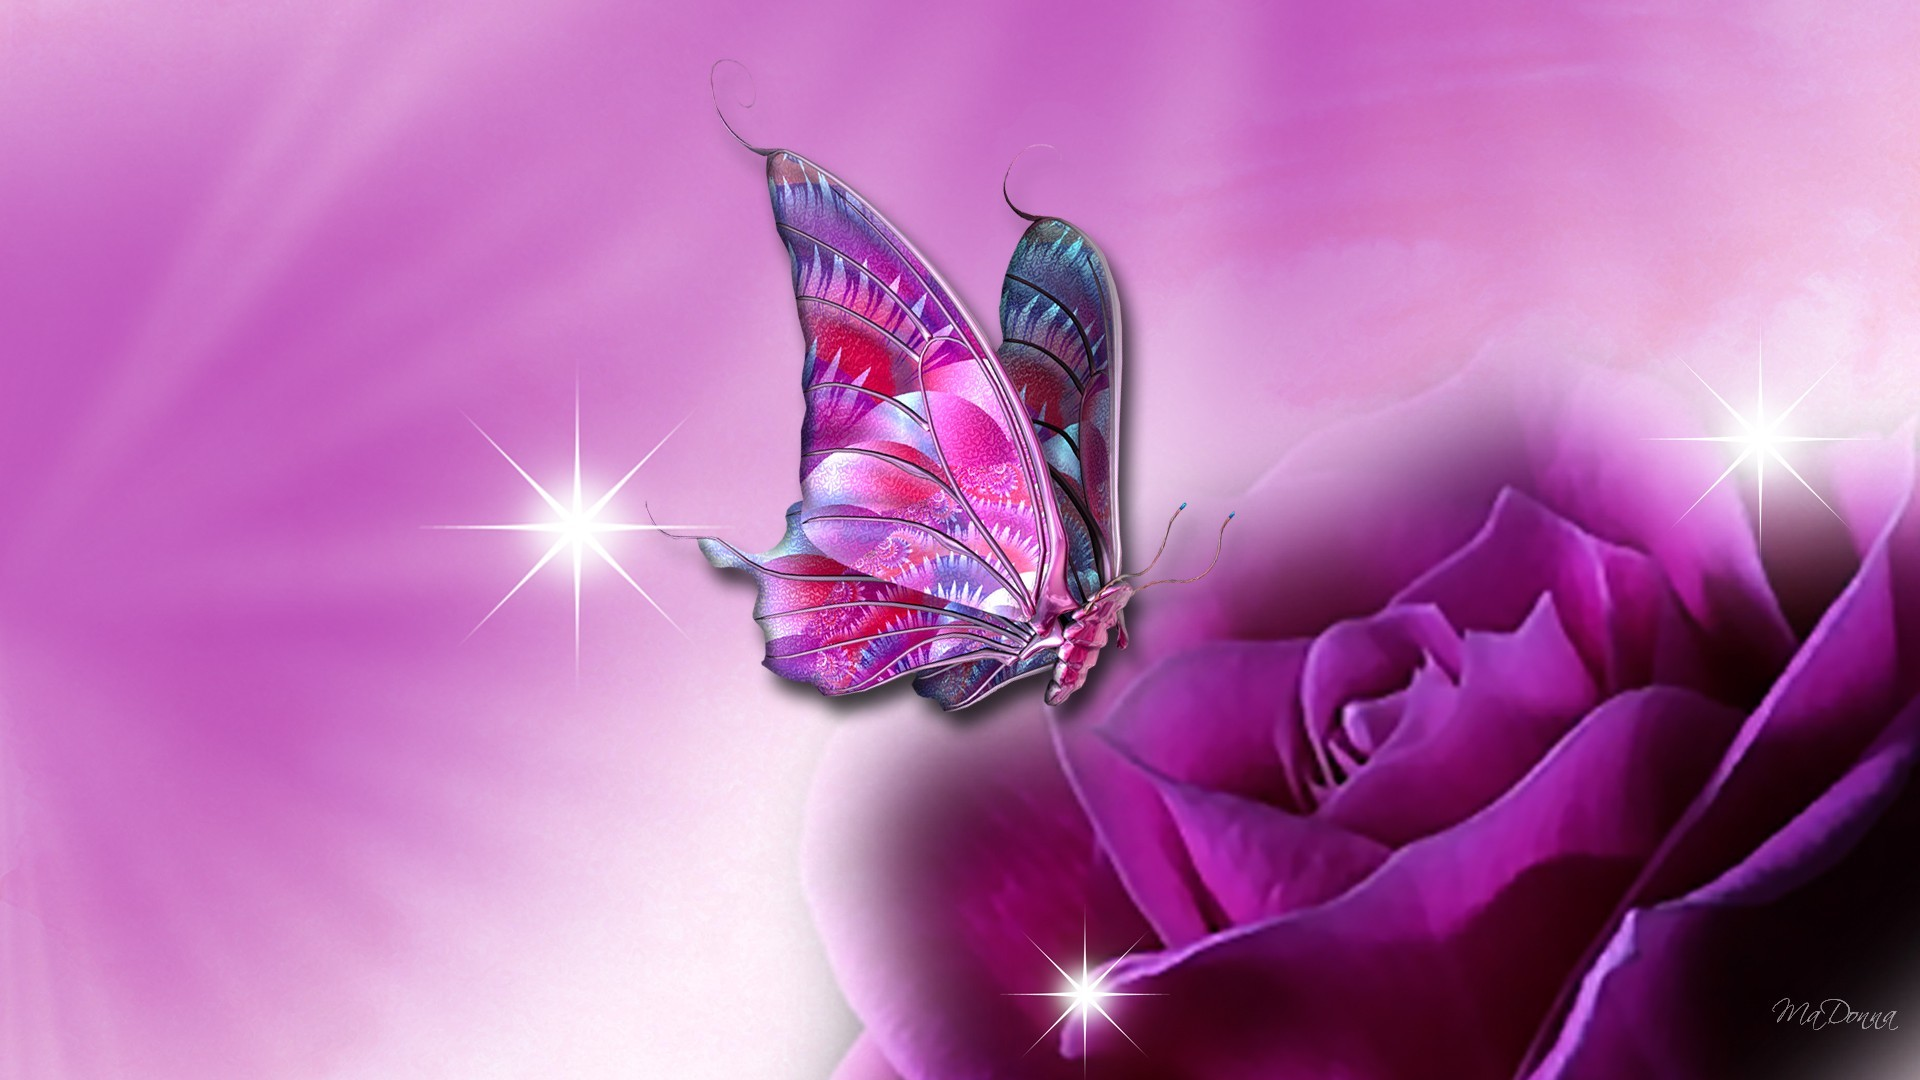 Res: 1920x1080, butterfly wallpaper purple